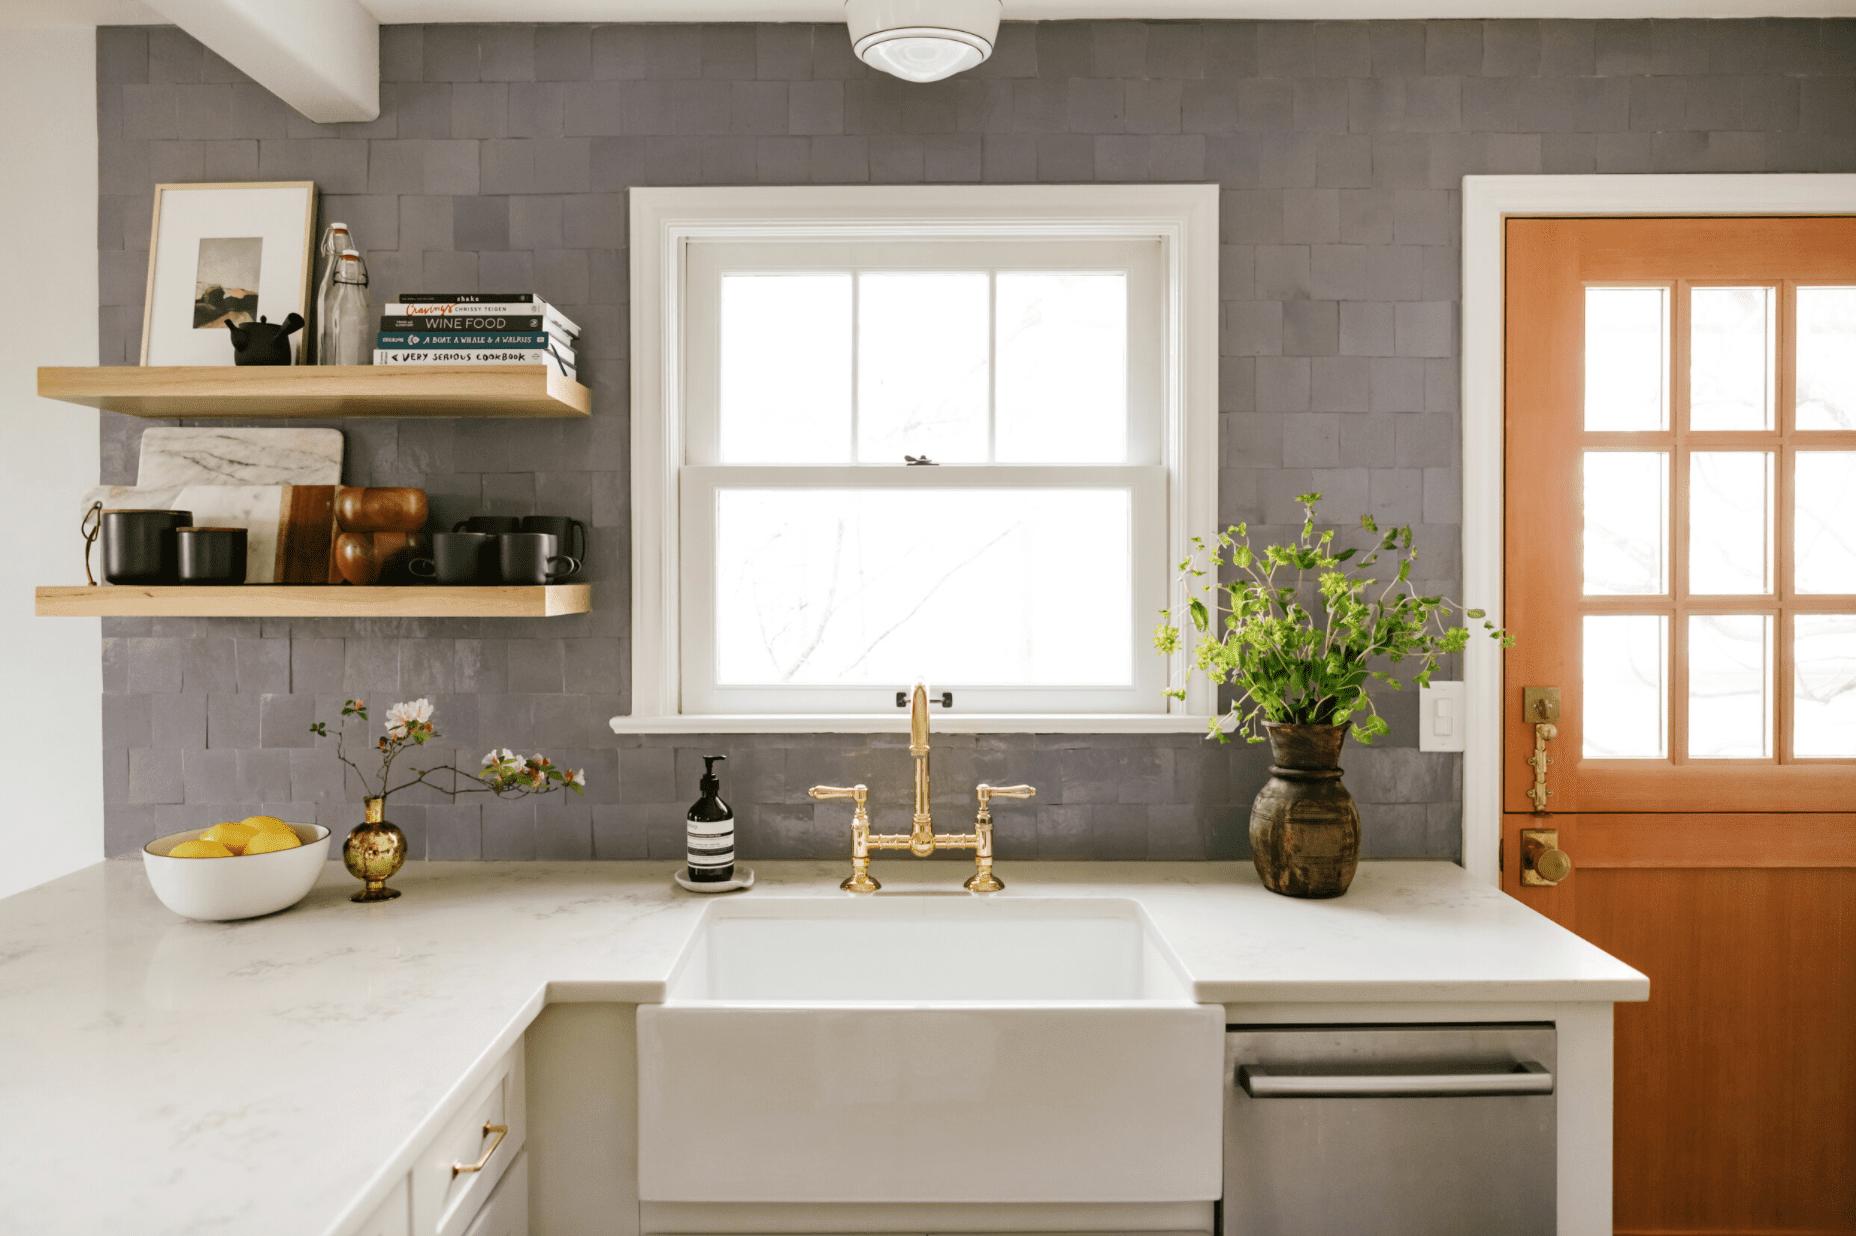 A kitchen backsplash lined with mauve tiles